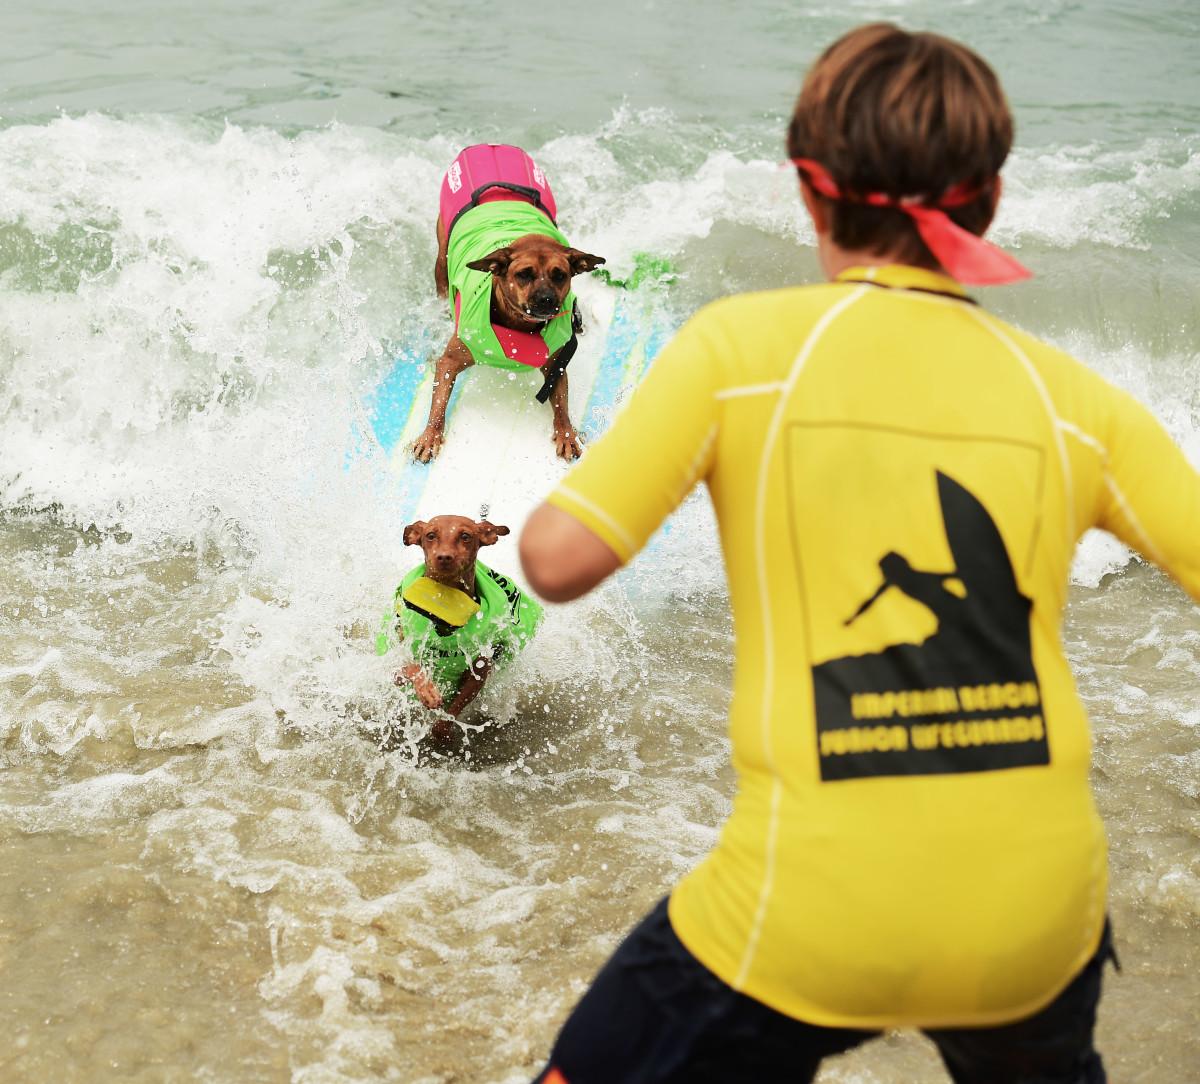 Surfing_Dogs_Gallery_006.jpg